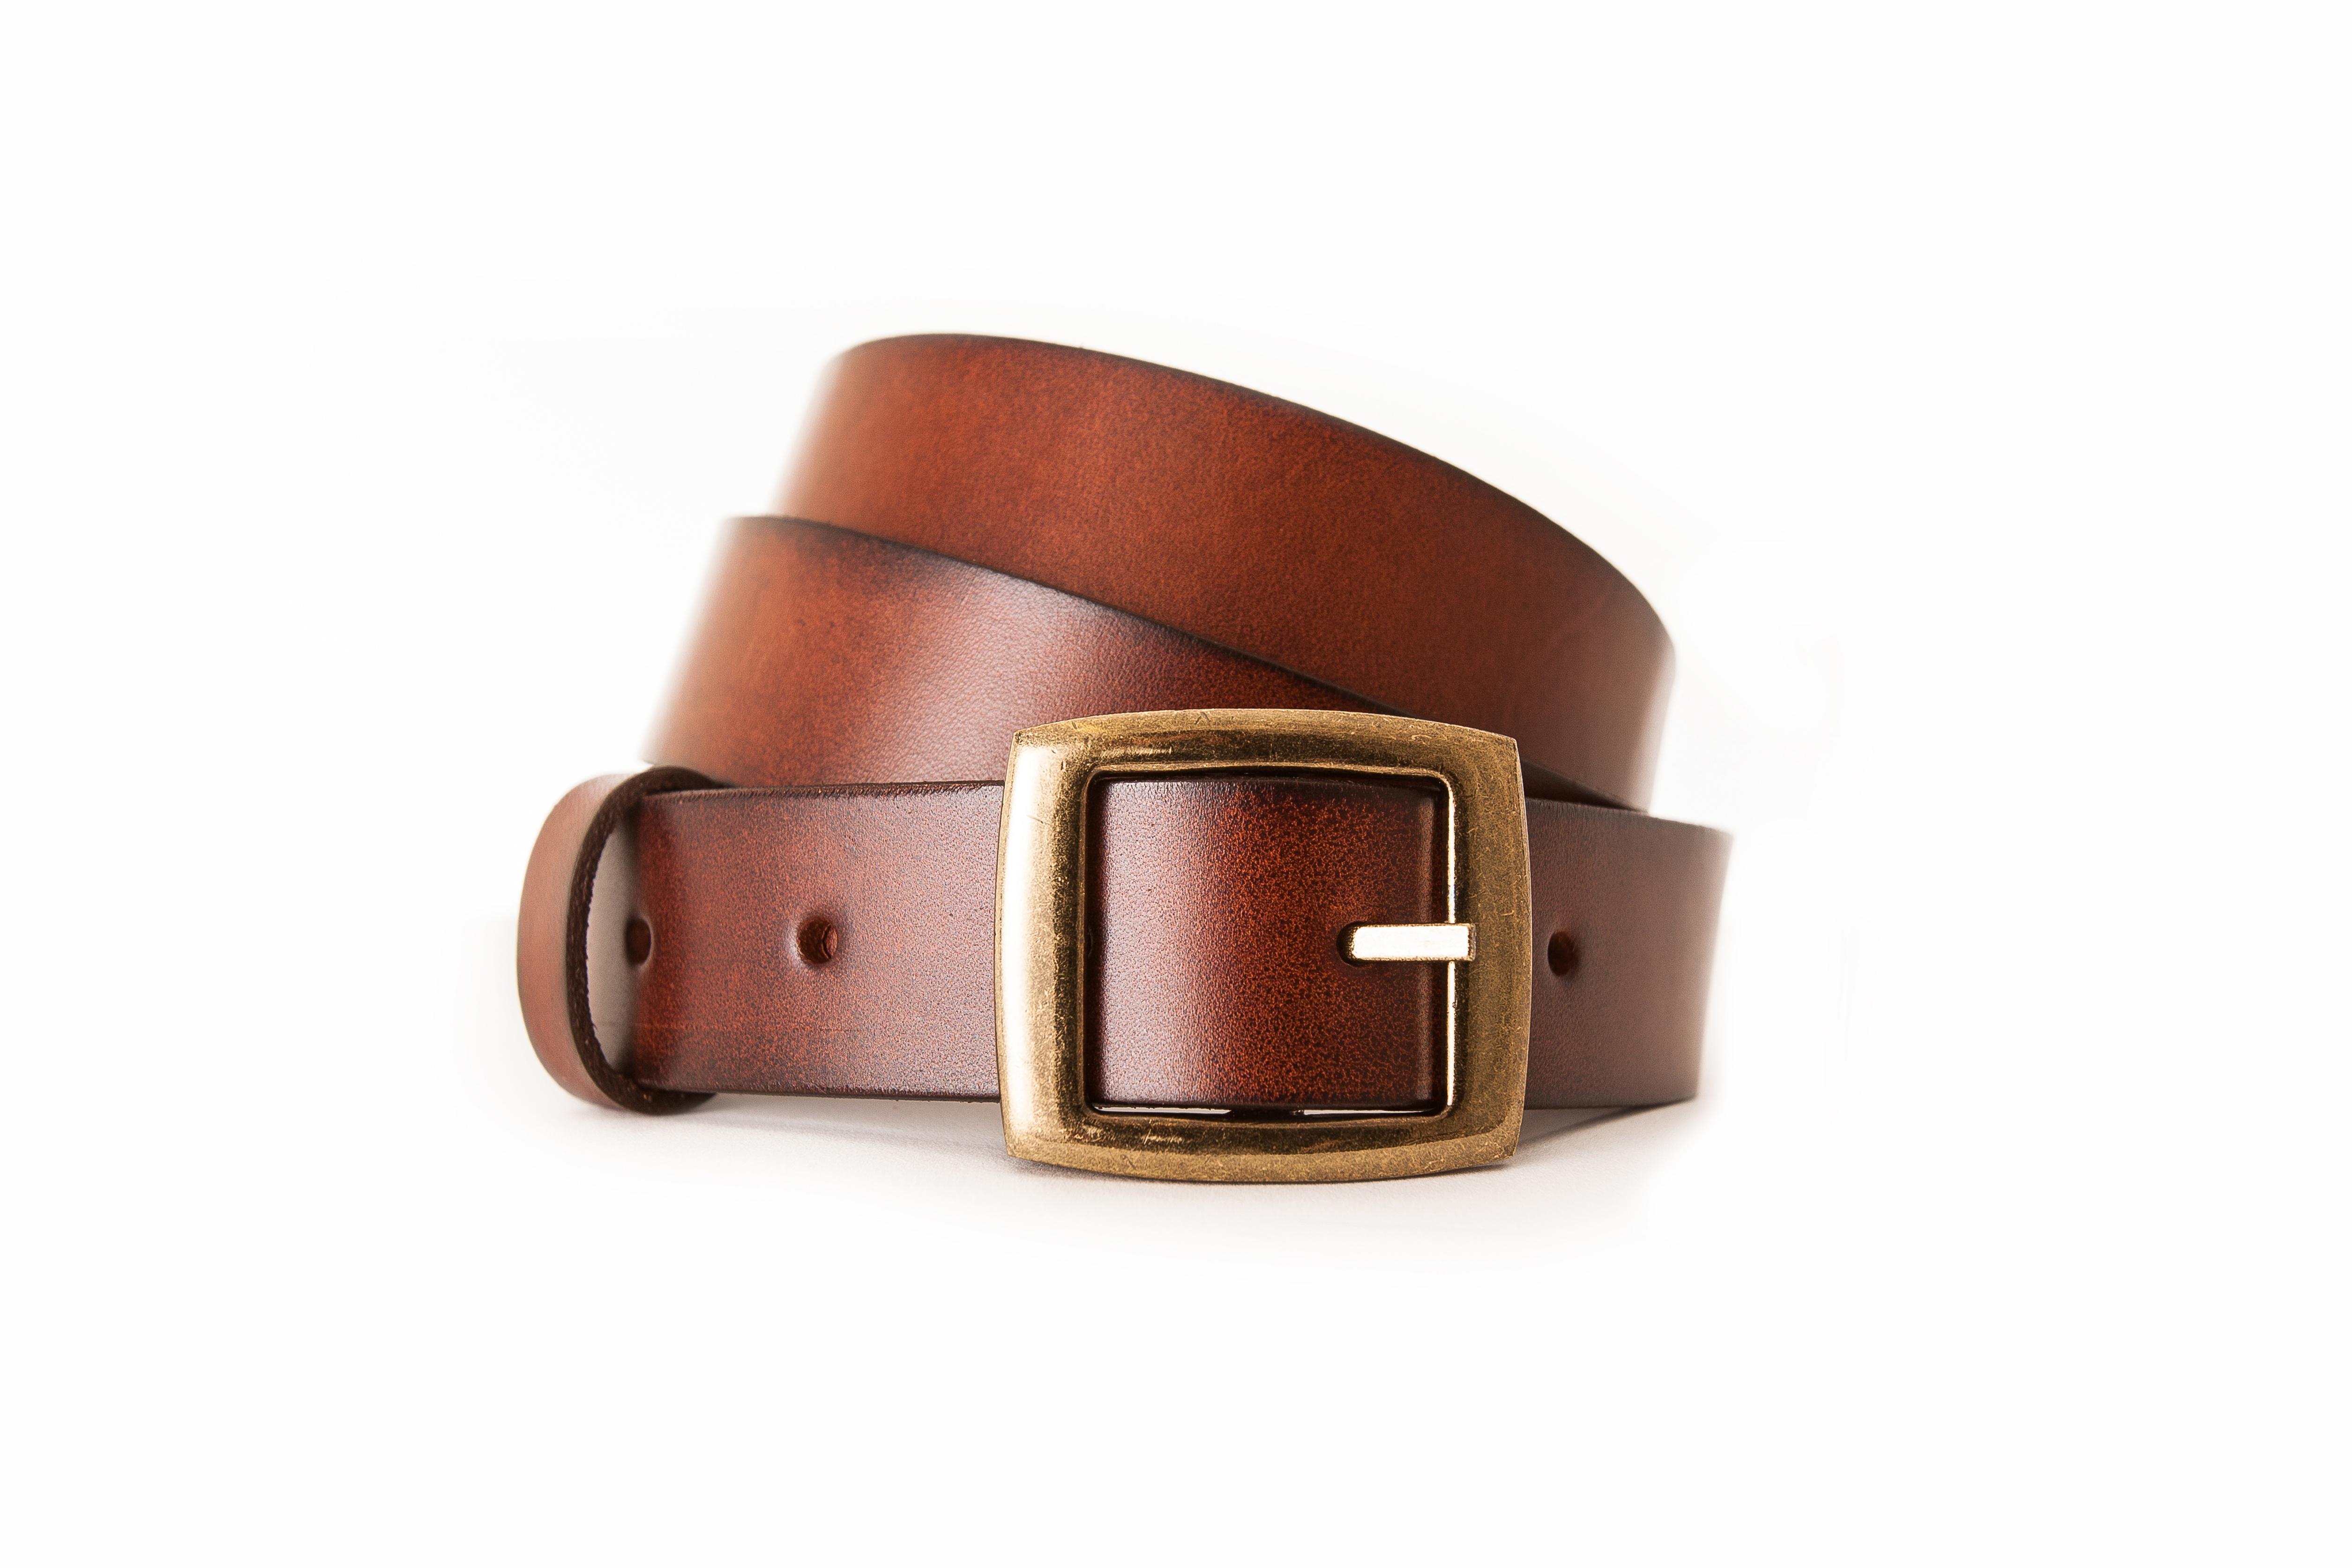 Plus-size women's women s plus size chain belt, including: Gold Multi Chain Belt - Accessories, Silver Braided Chain Belt - Accessories, Womens Plus Size Chain Belt.